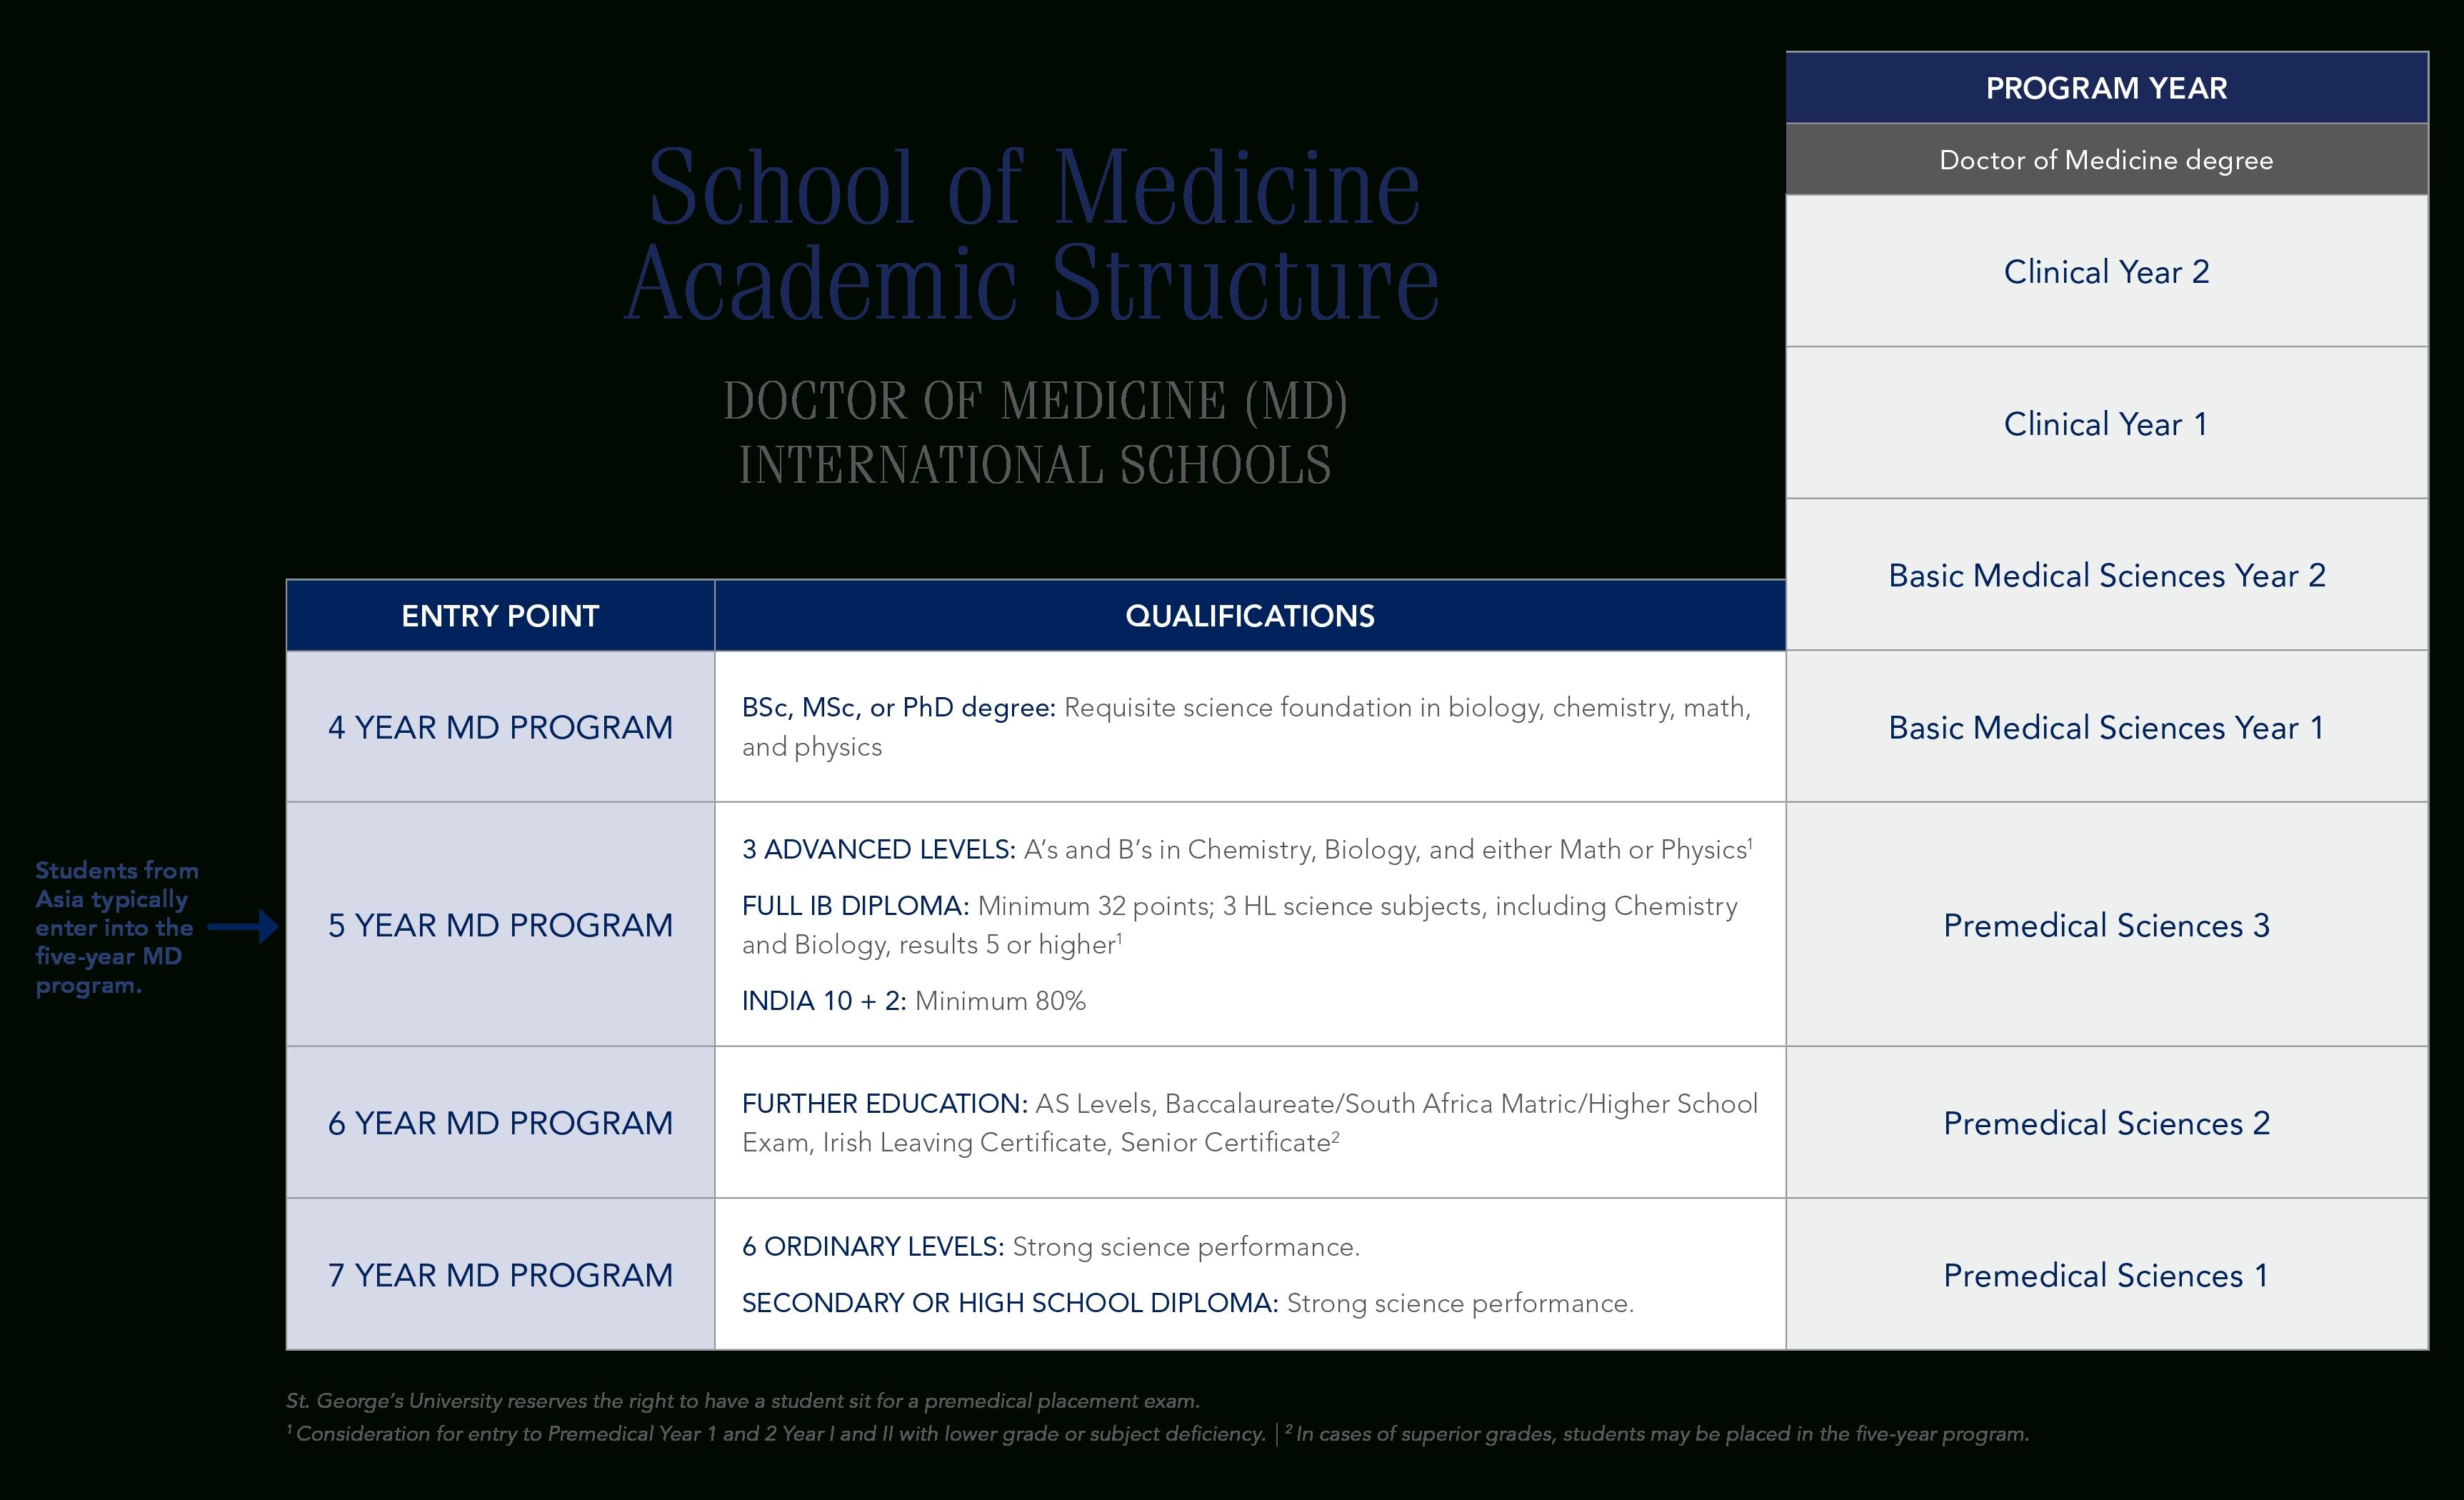 Canada | St. George's University-Sgu Academic Calendar January 2020